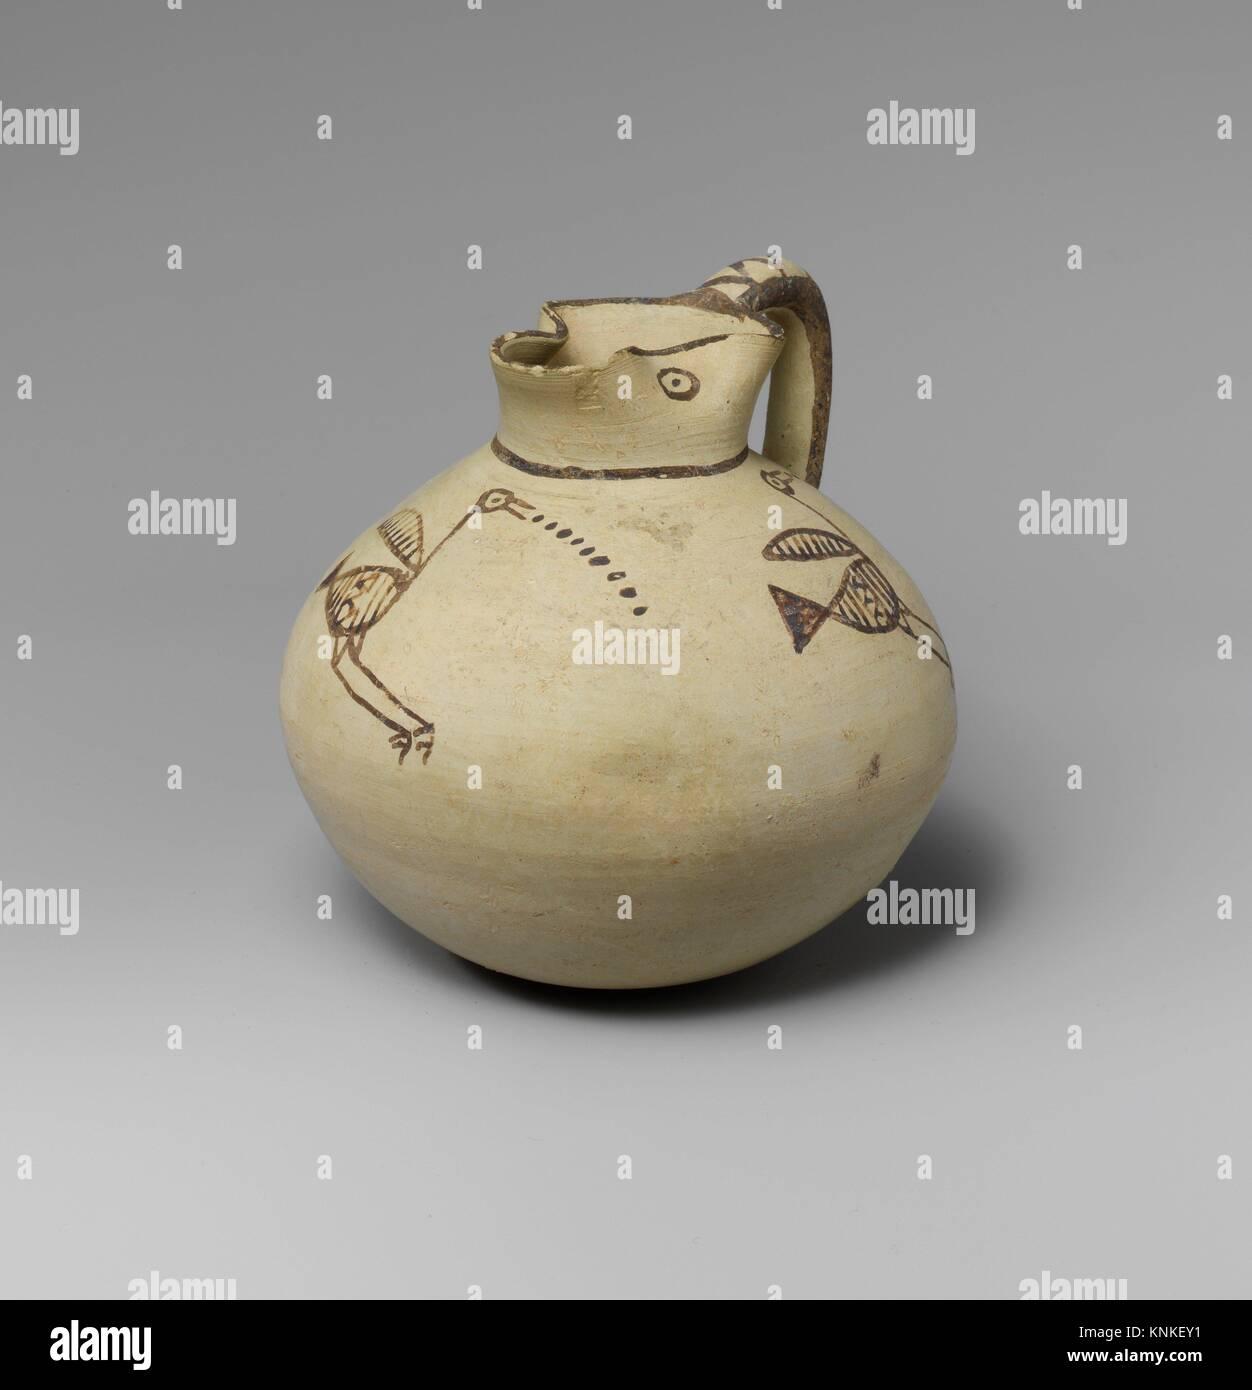 Terracotta jug. Period: Cypro-Archaic I; Date: 750-600 B.C; Culture: Cypriot; Medium: Terracotta; Dimensions: H. Stock Photo